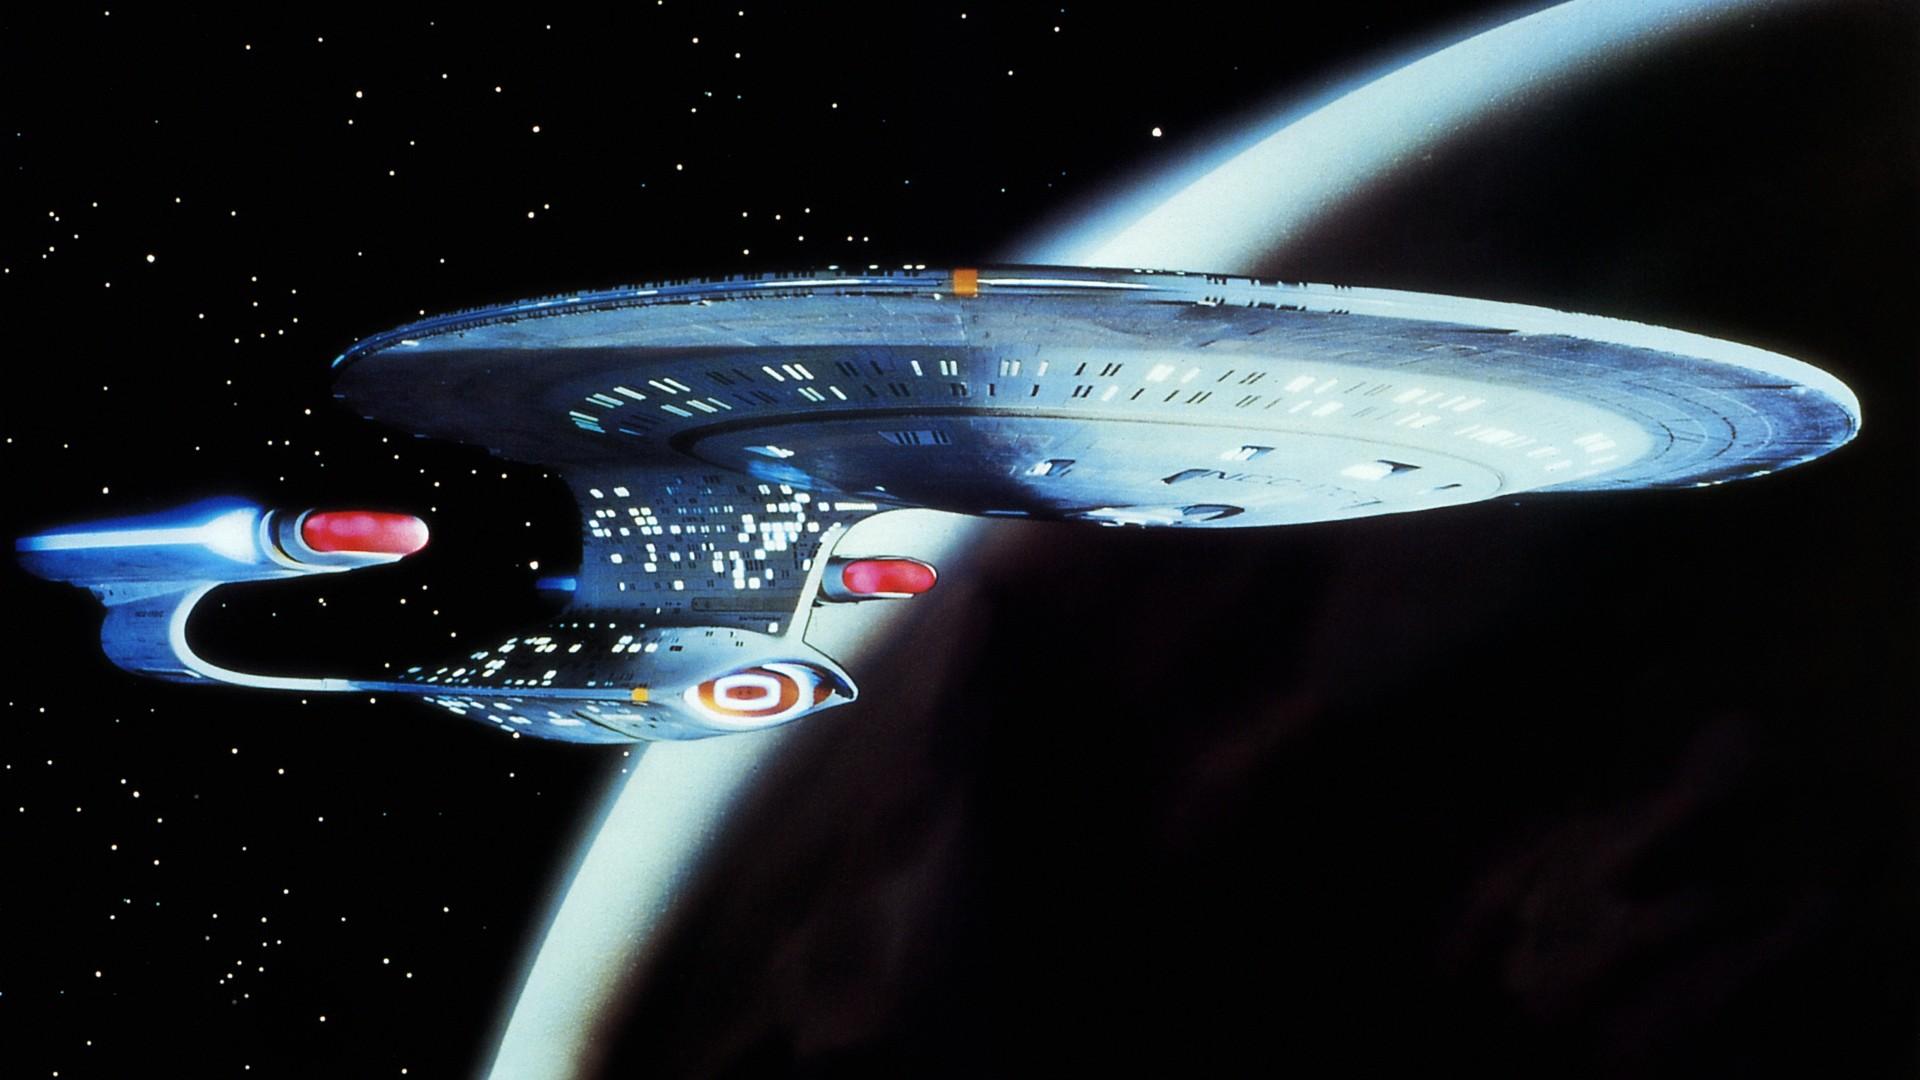 Star Trek Wallpaper Star Trek Wallpaper Background Desktop  Backgrounds,Photos in HD Widescreen High Quality Resolutions for Free.